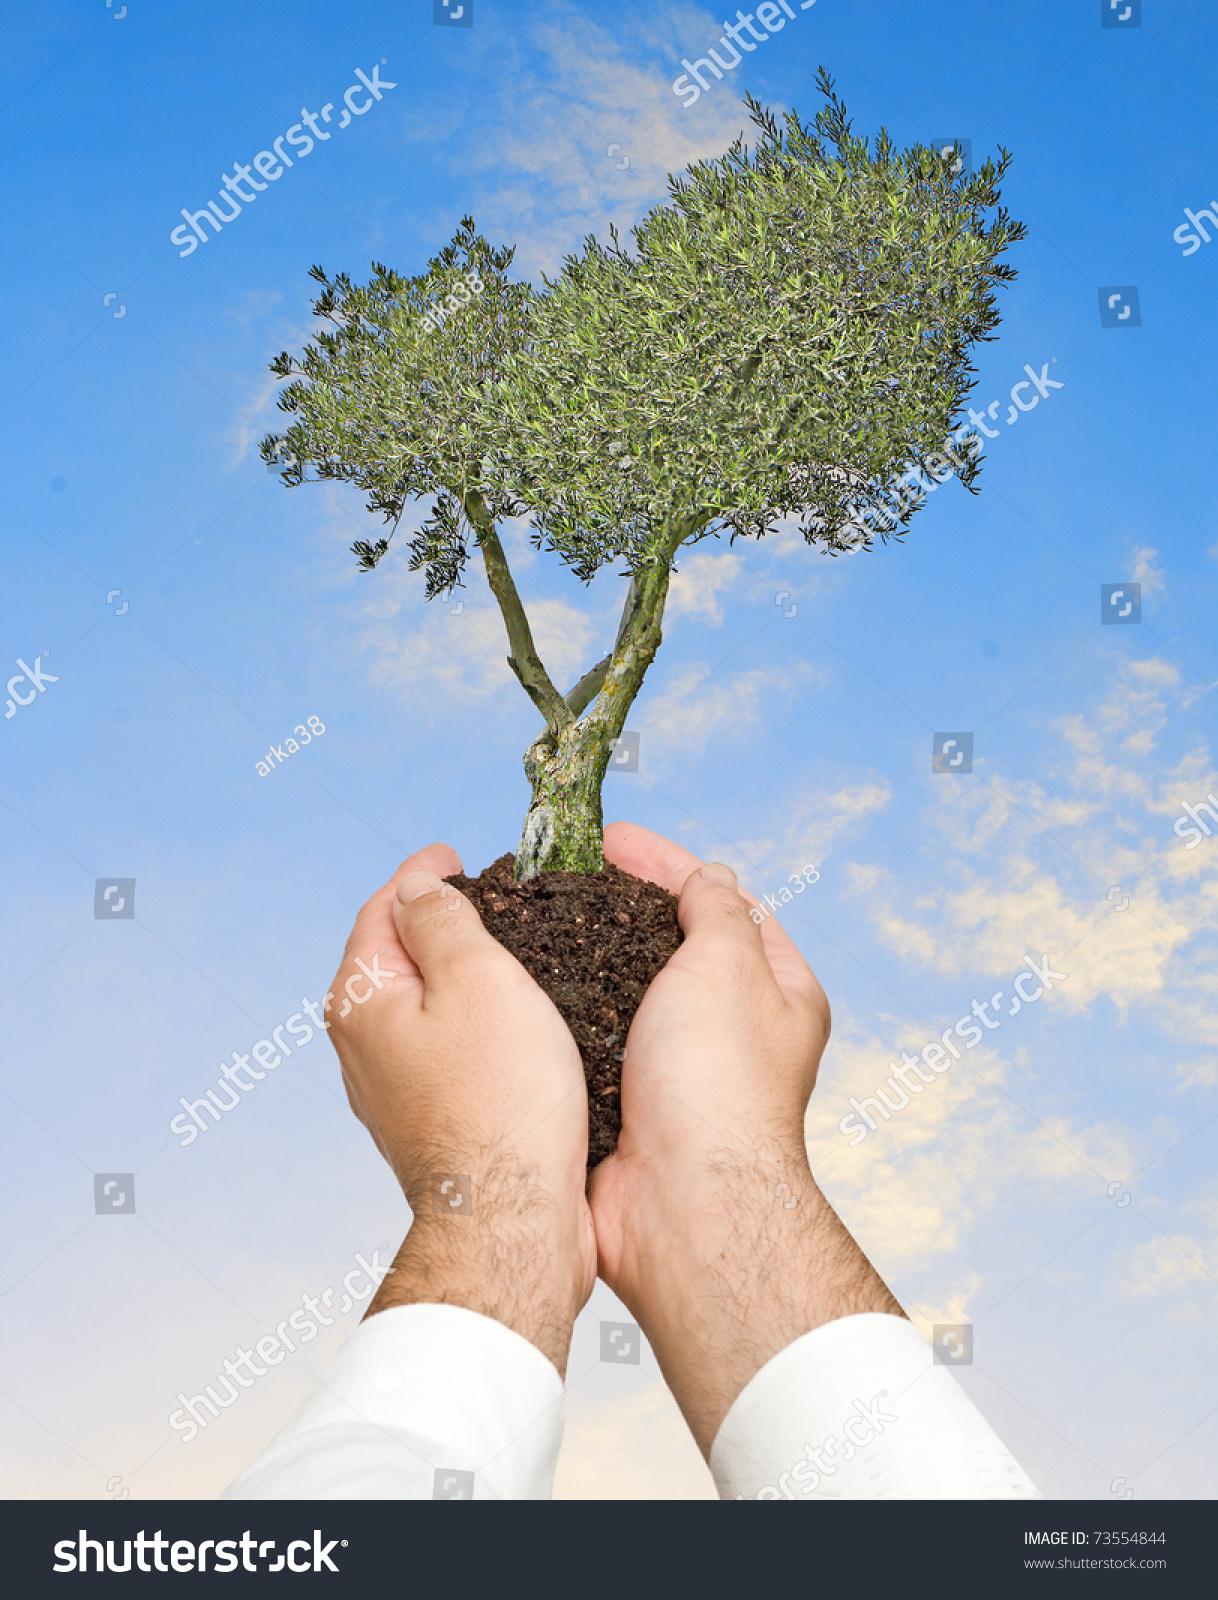 Olive tree hands symbol nature protection stock photo 73554844 olive tree in hands as a symbol of nature protection buycottarizona Choice Image